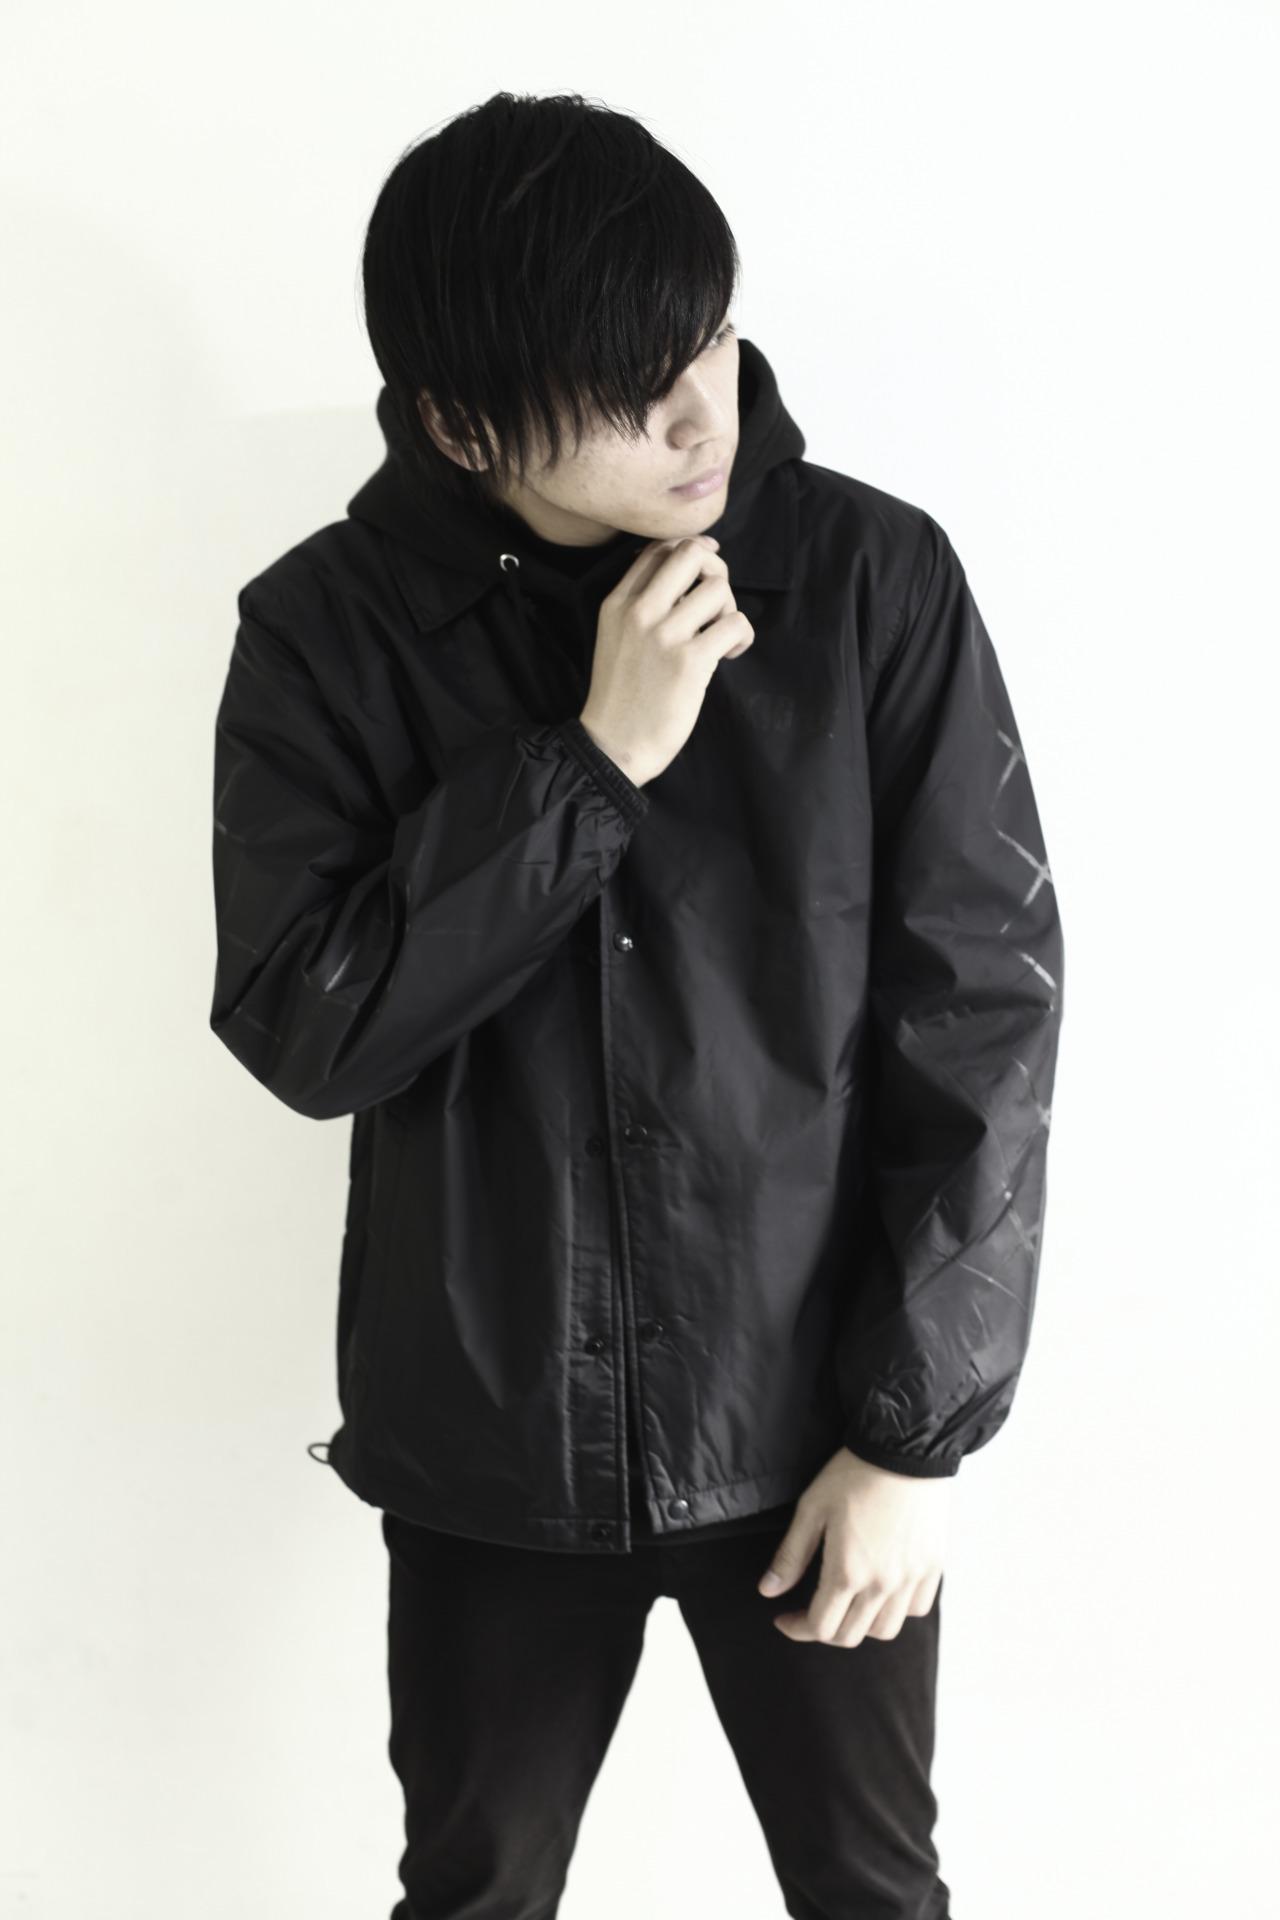 deathsight C JKT / BLACK x BLACK - 画像5